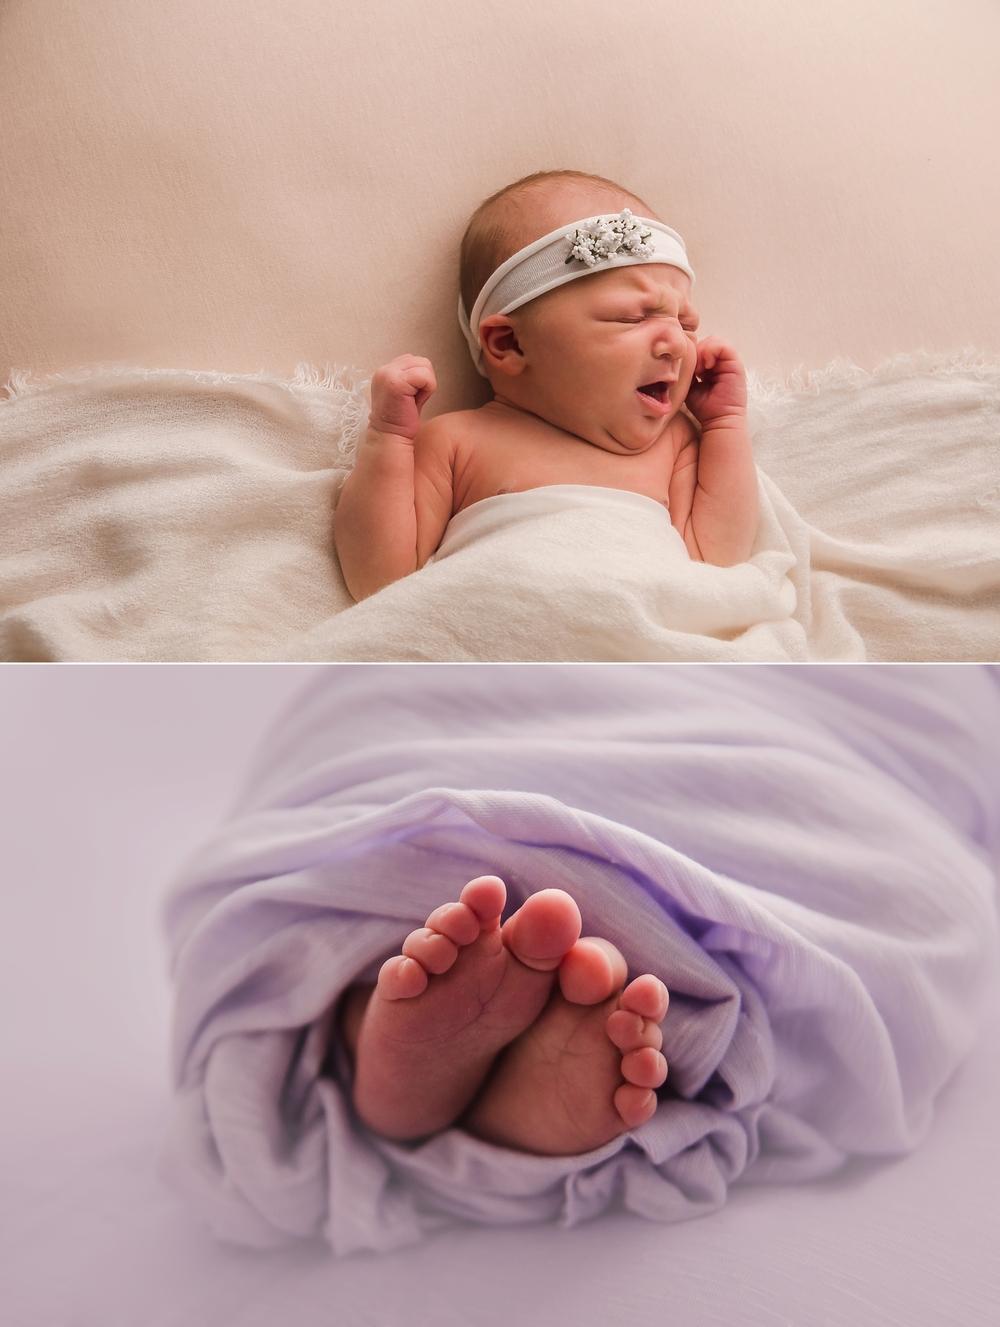 Newborn yawn